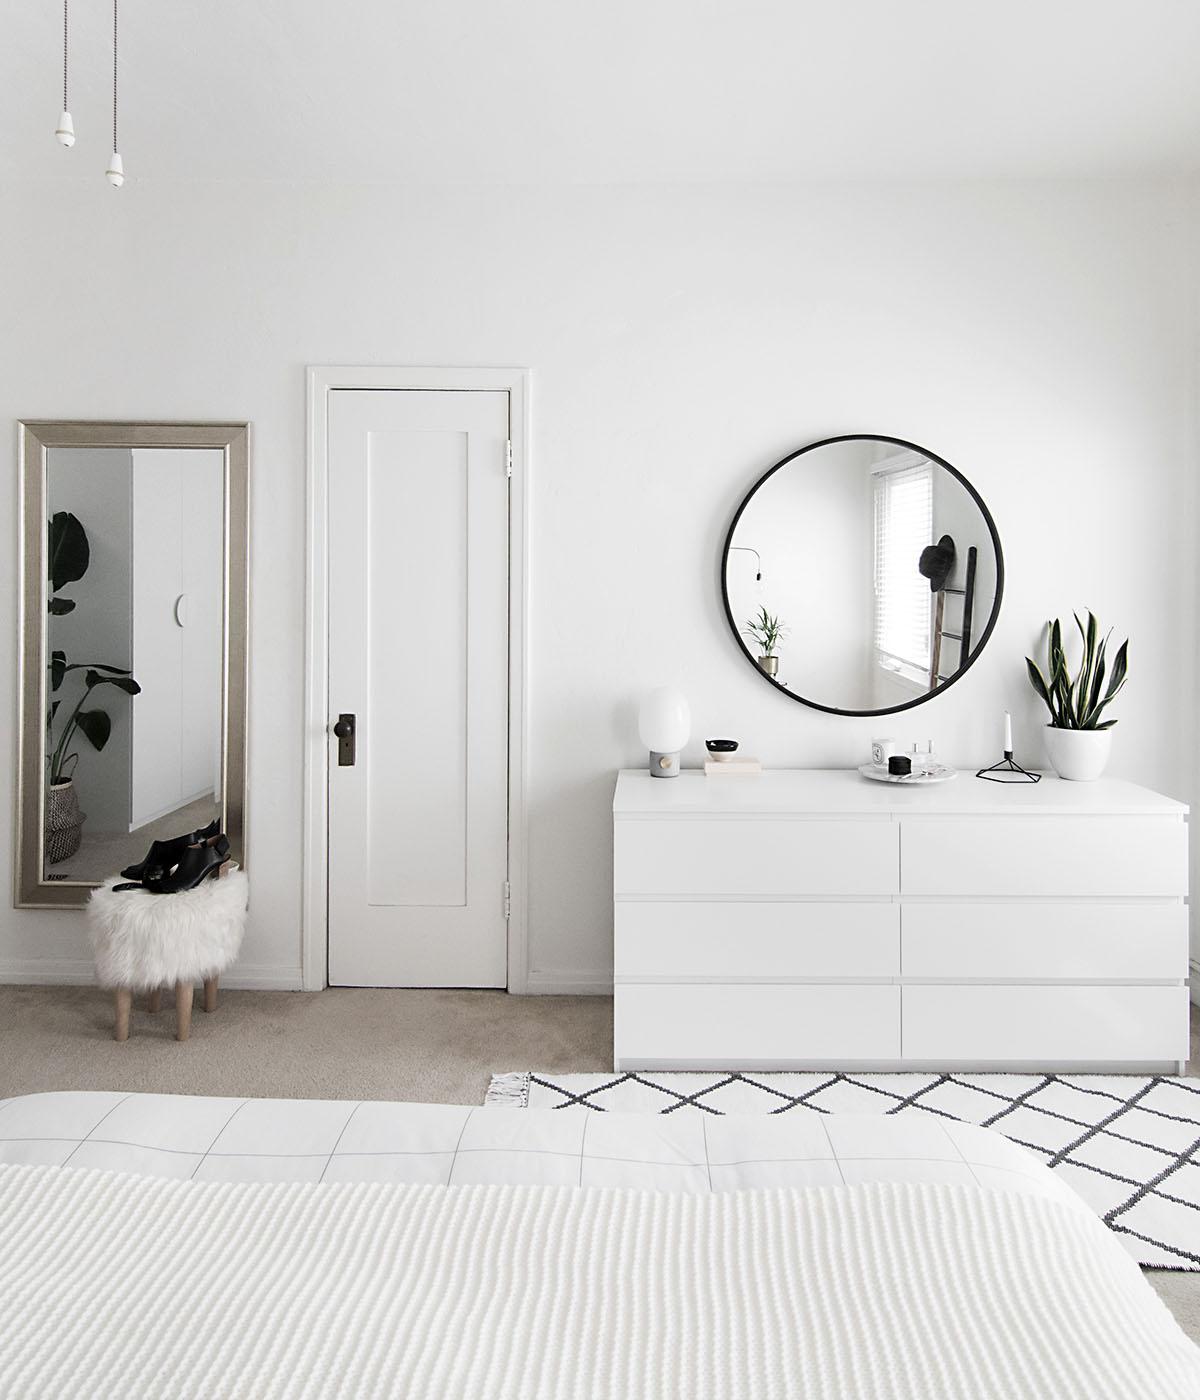 How to Achieve a Minimal Scandinavian Bedroom - Homey Oh My on Minimalist Bedroom  id=16191